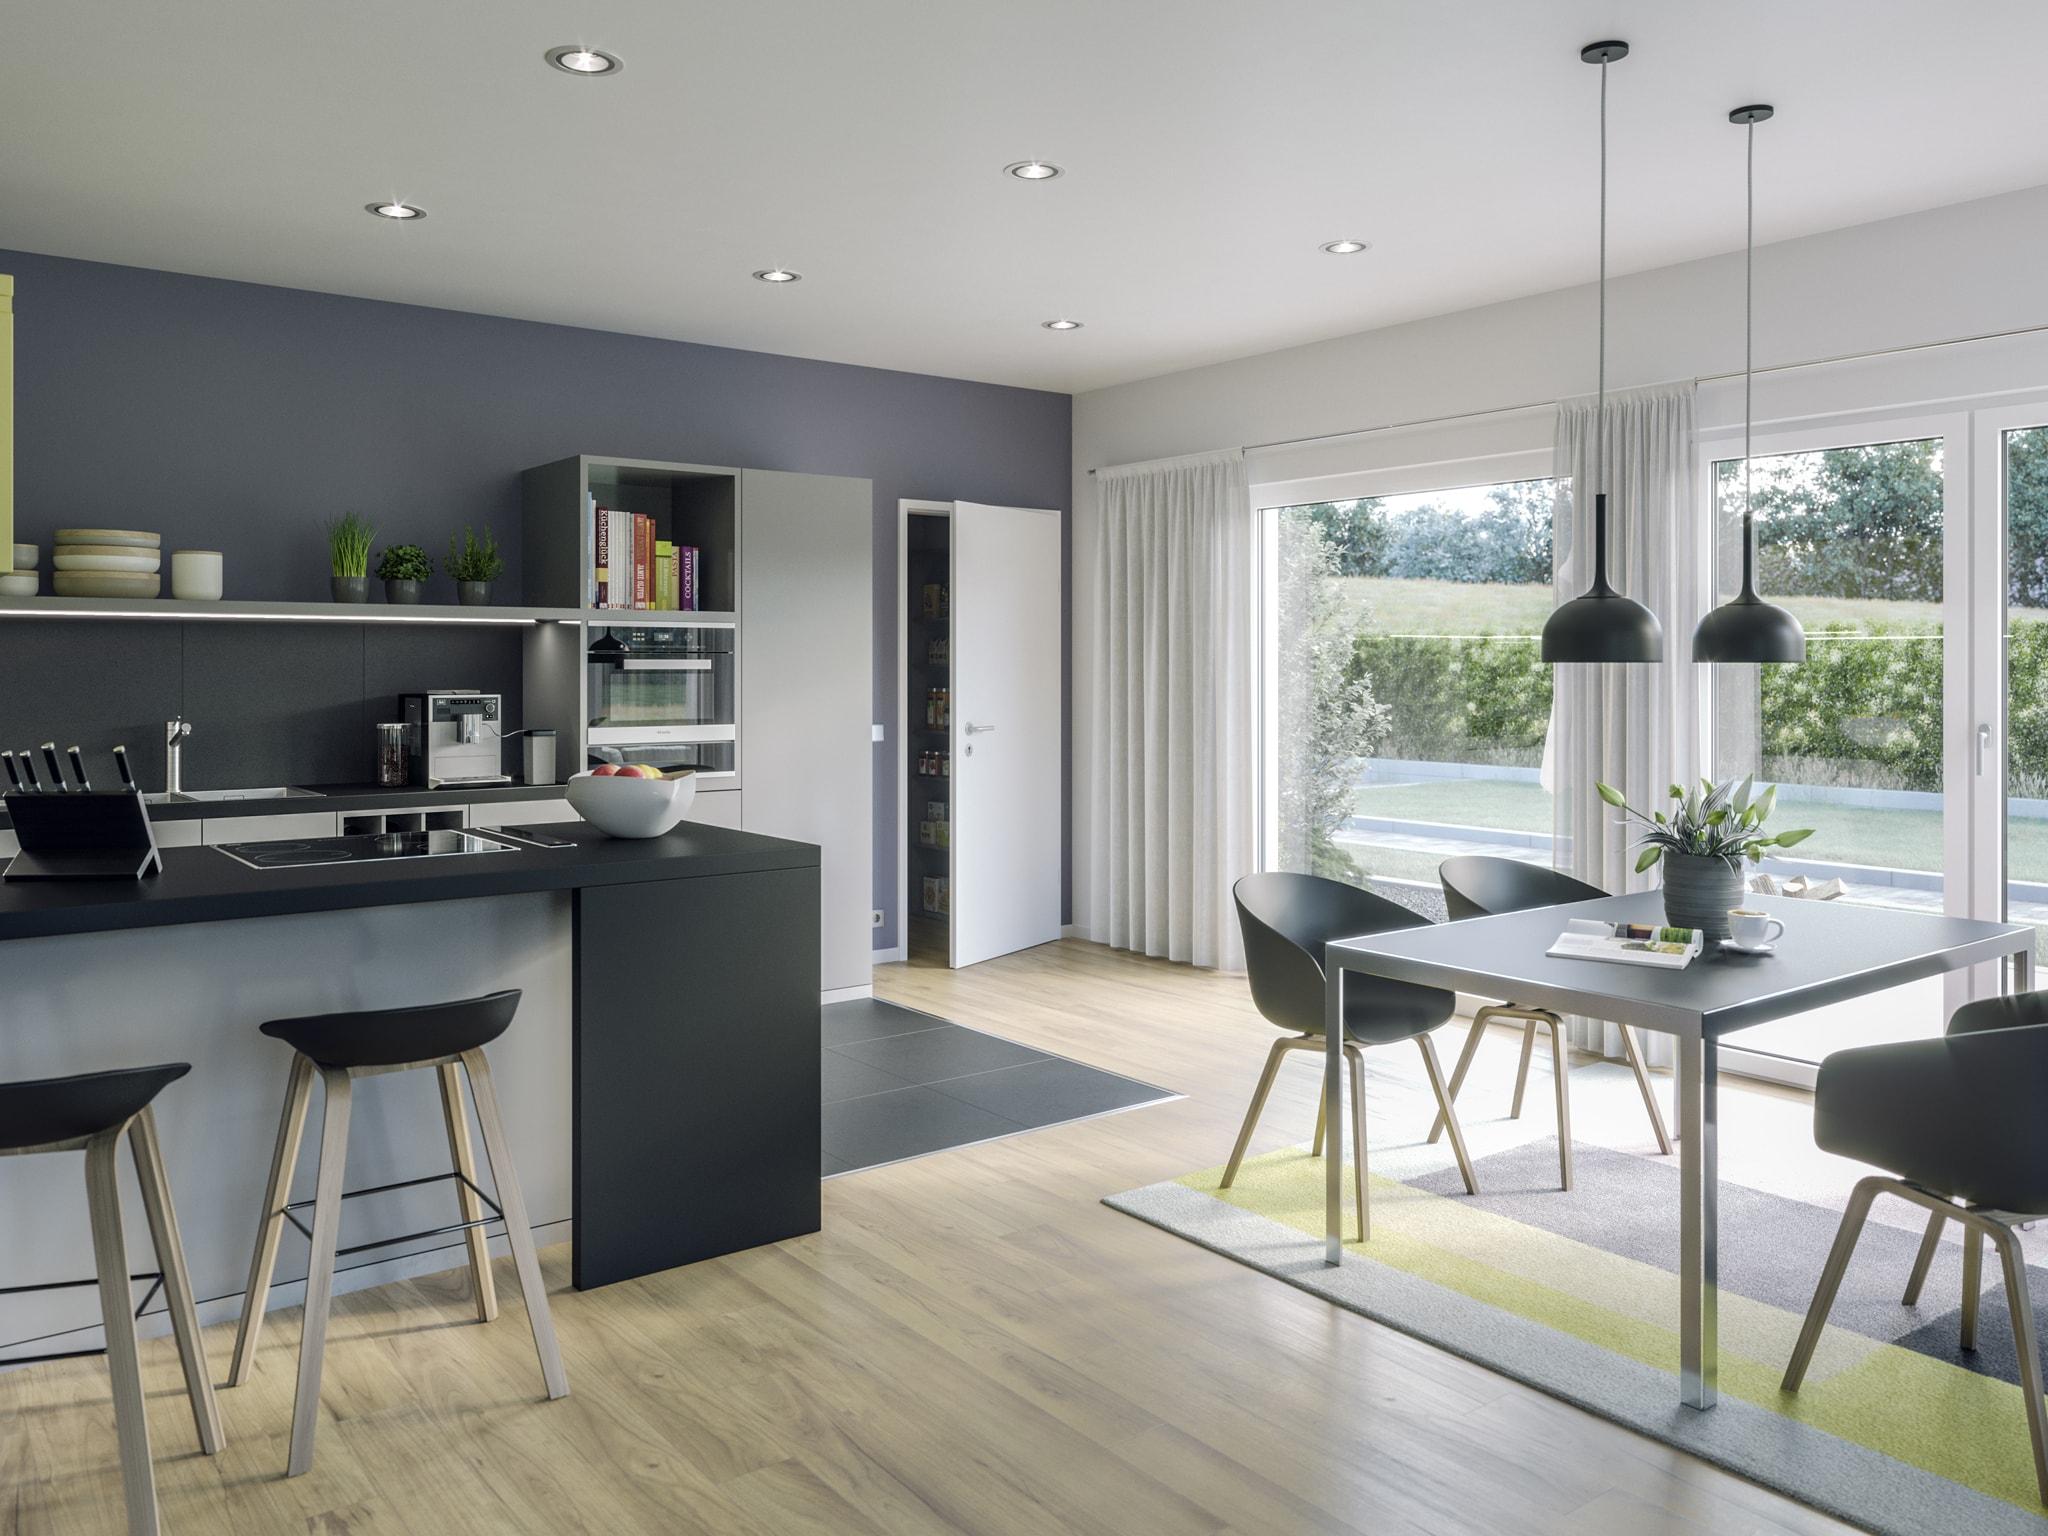 Küche & Esstisch Inneneinrichtung Ideen Bungalow AMBIENCE 88 V2 Bien Zenker Fertighaus - HausbauDirekt.de